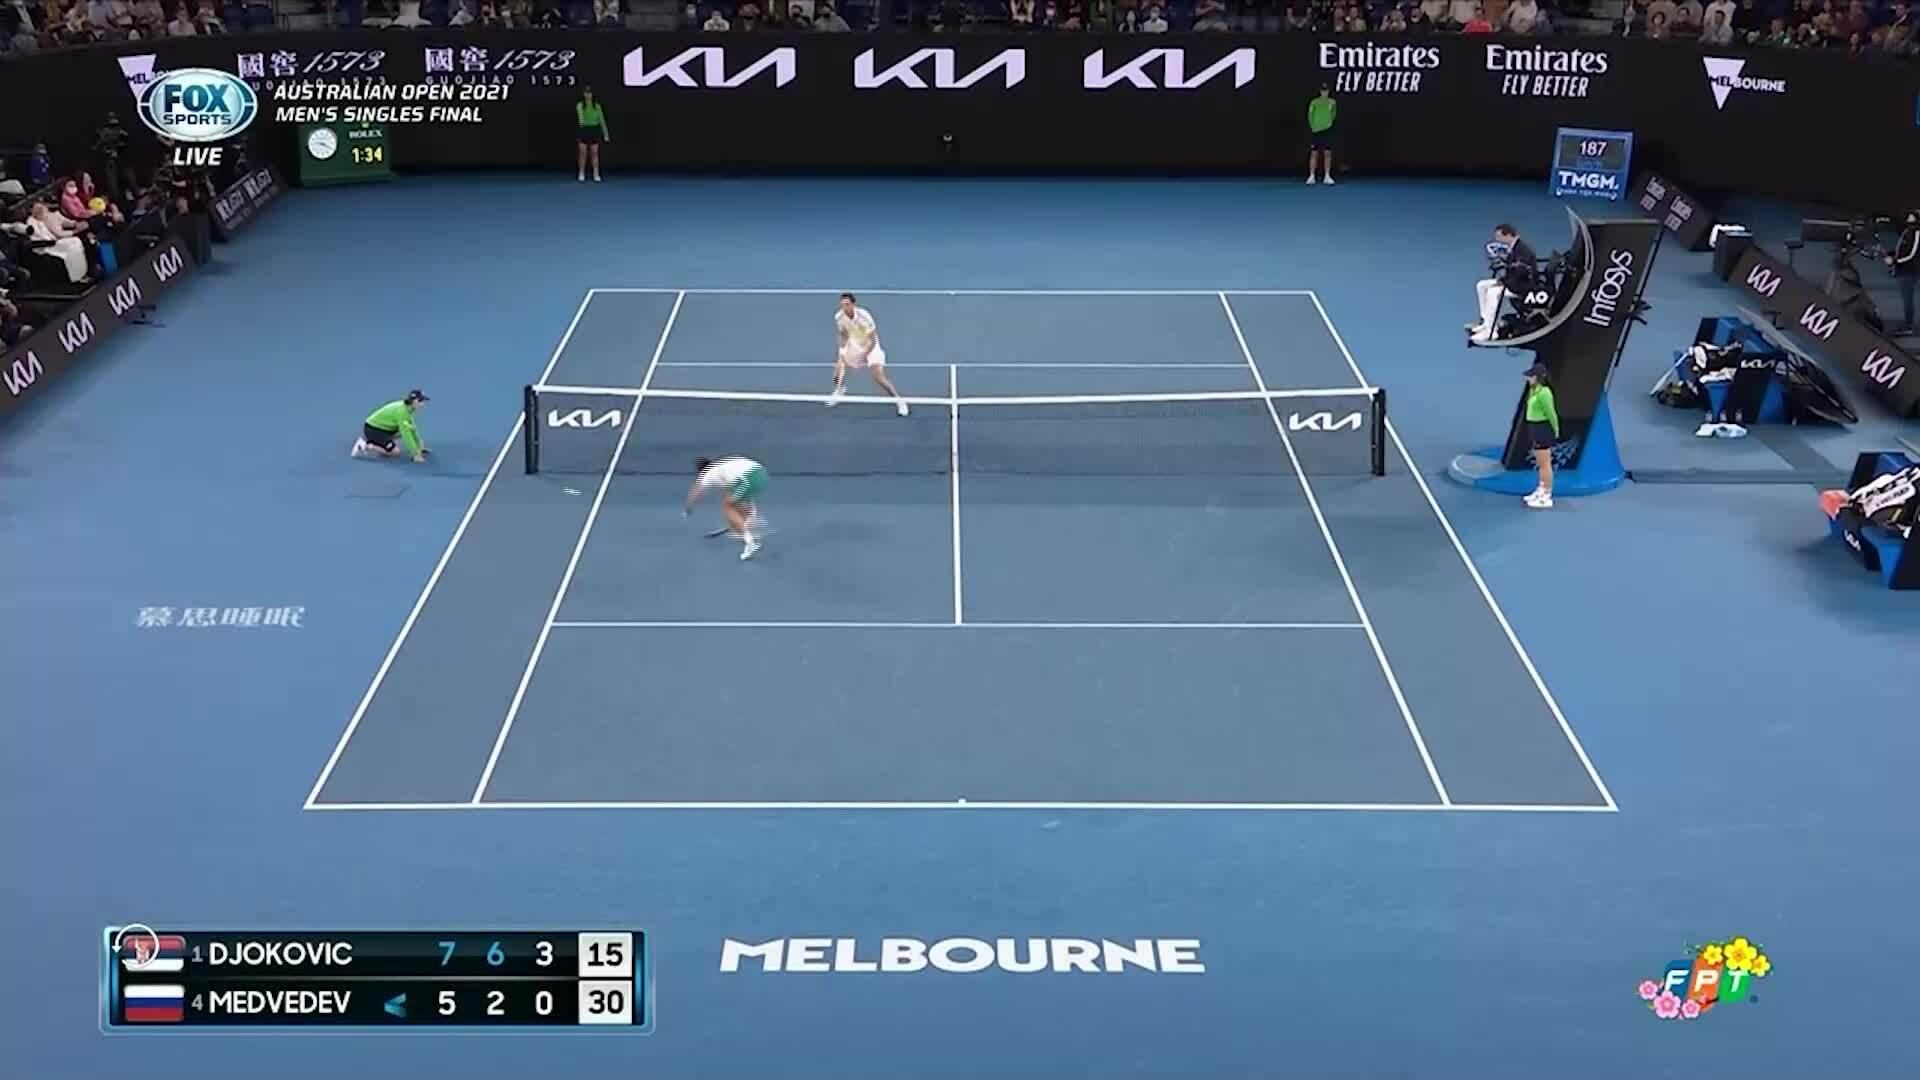 Djokovic dẫn 7-5, 6-2, 5-2